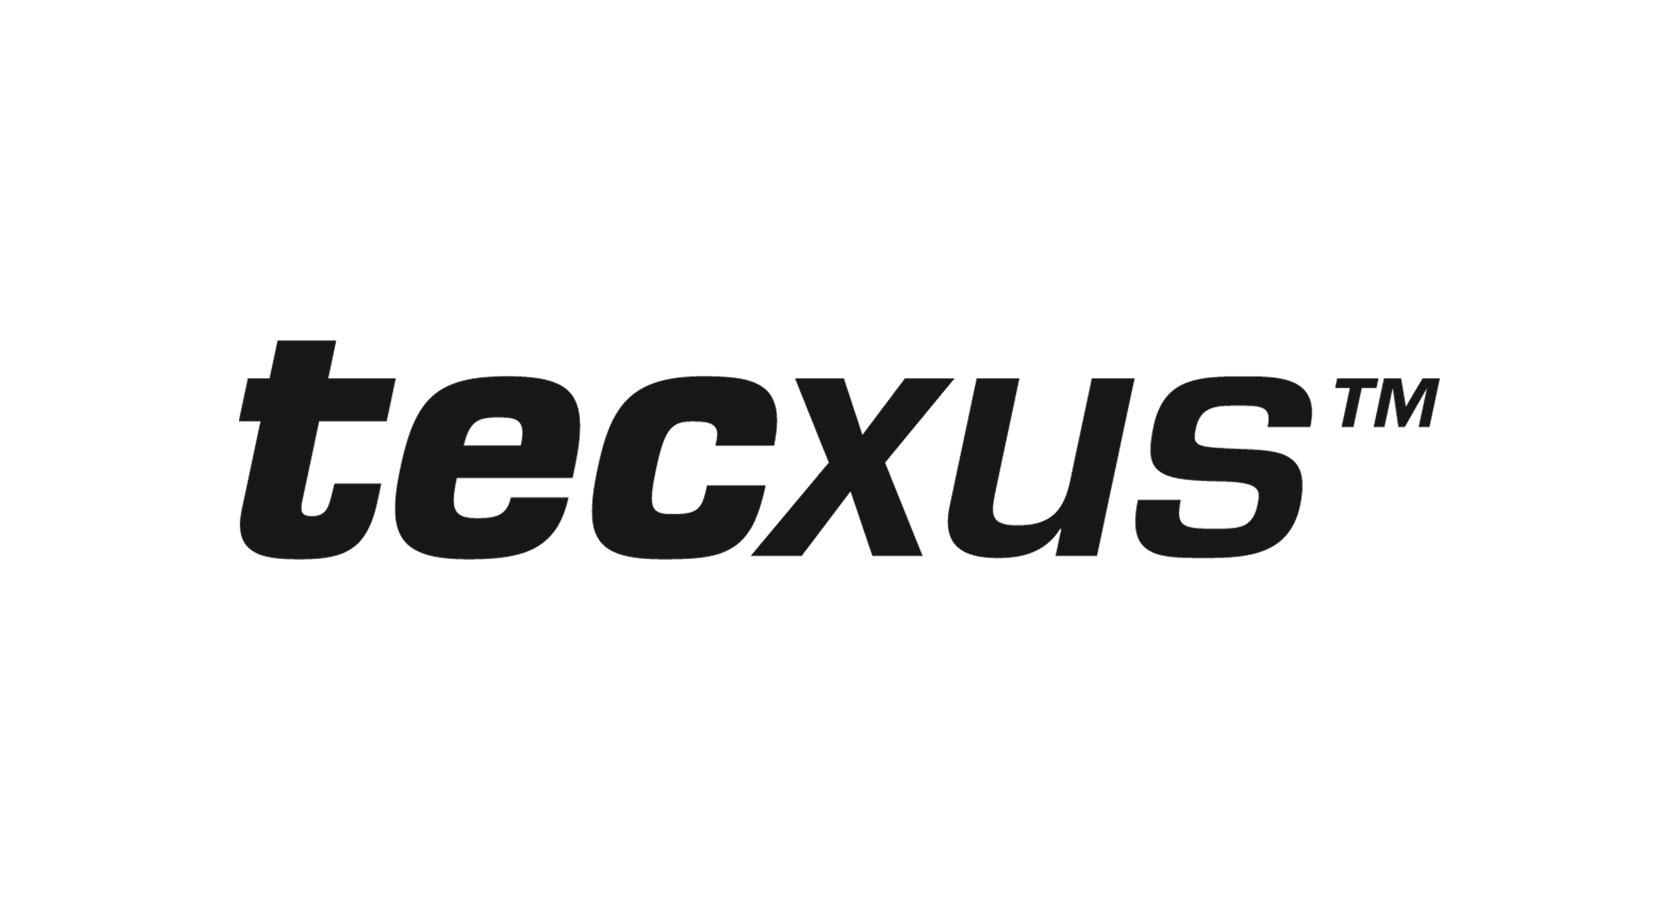 Logo des Batterie- und Akkuherstellers Tecxus